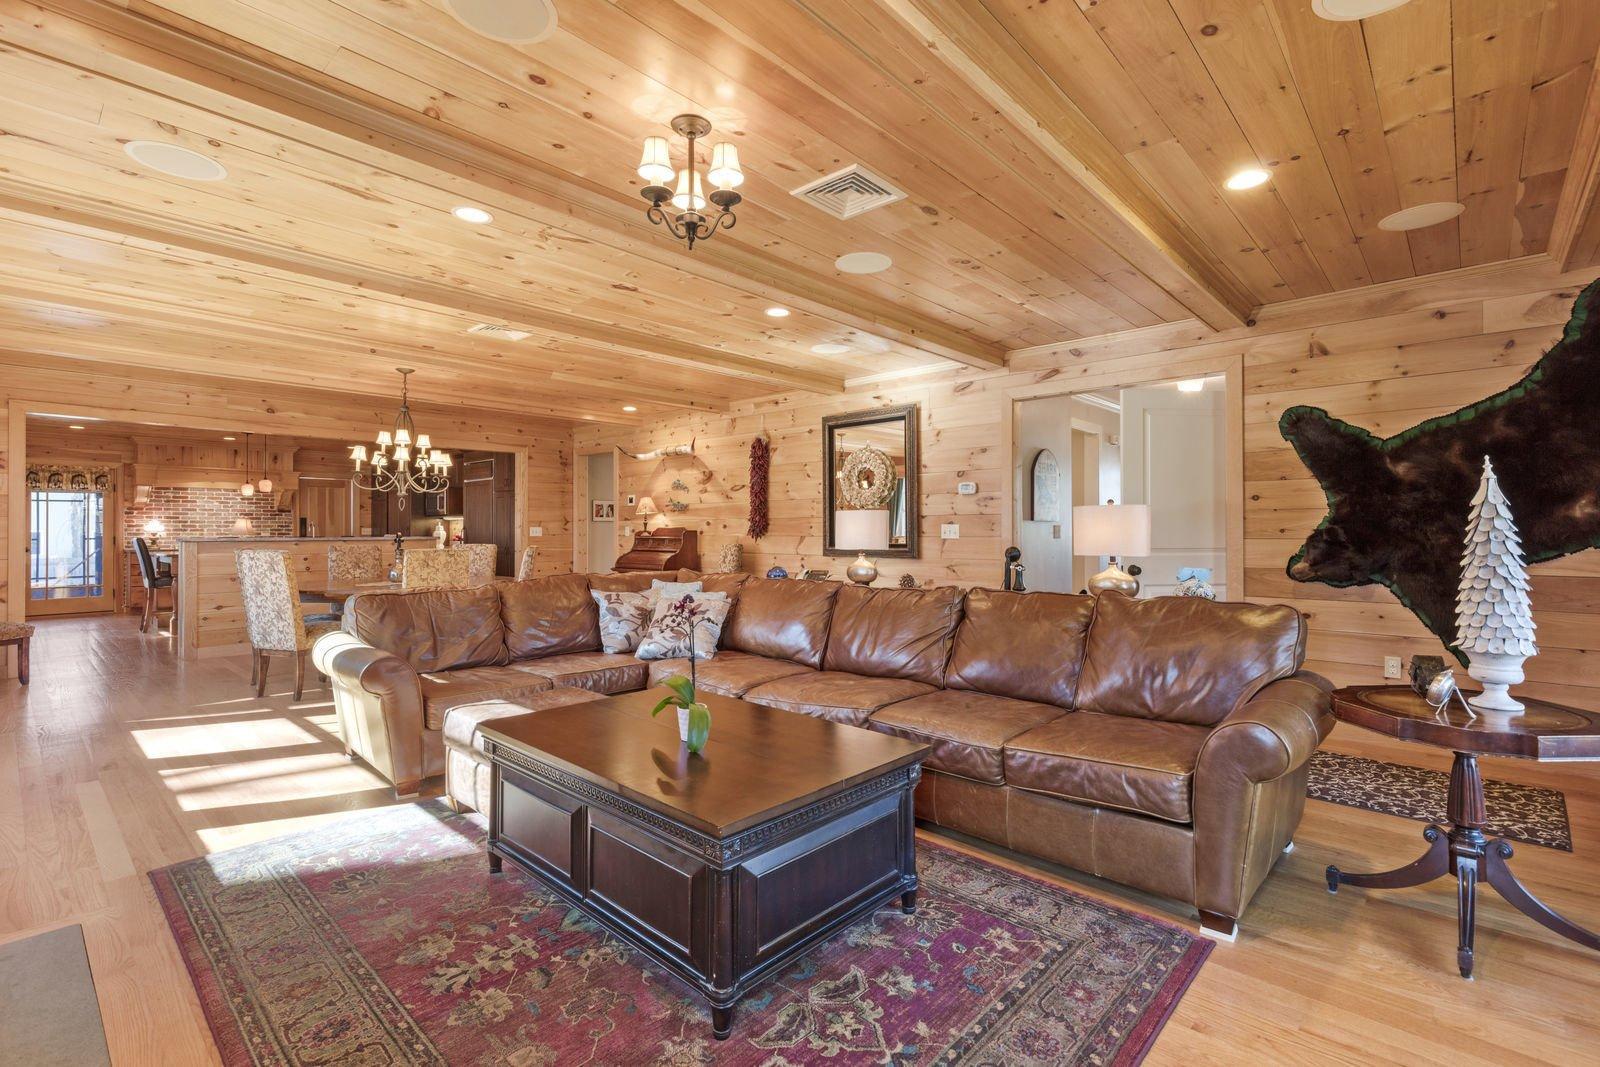 Living Room, Ceiling Lighting, Sectional, Recessed Lighting, and Medium Hardwood Floor  Shingle Style Rustic Chic